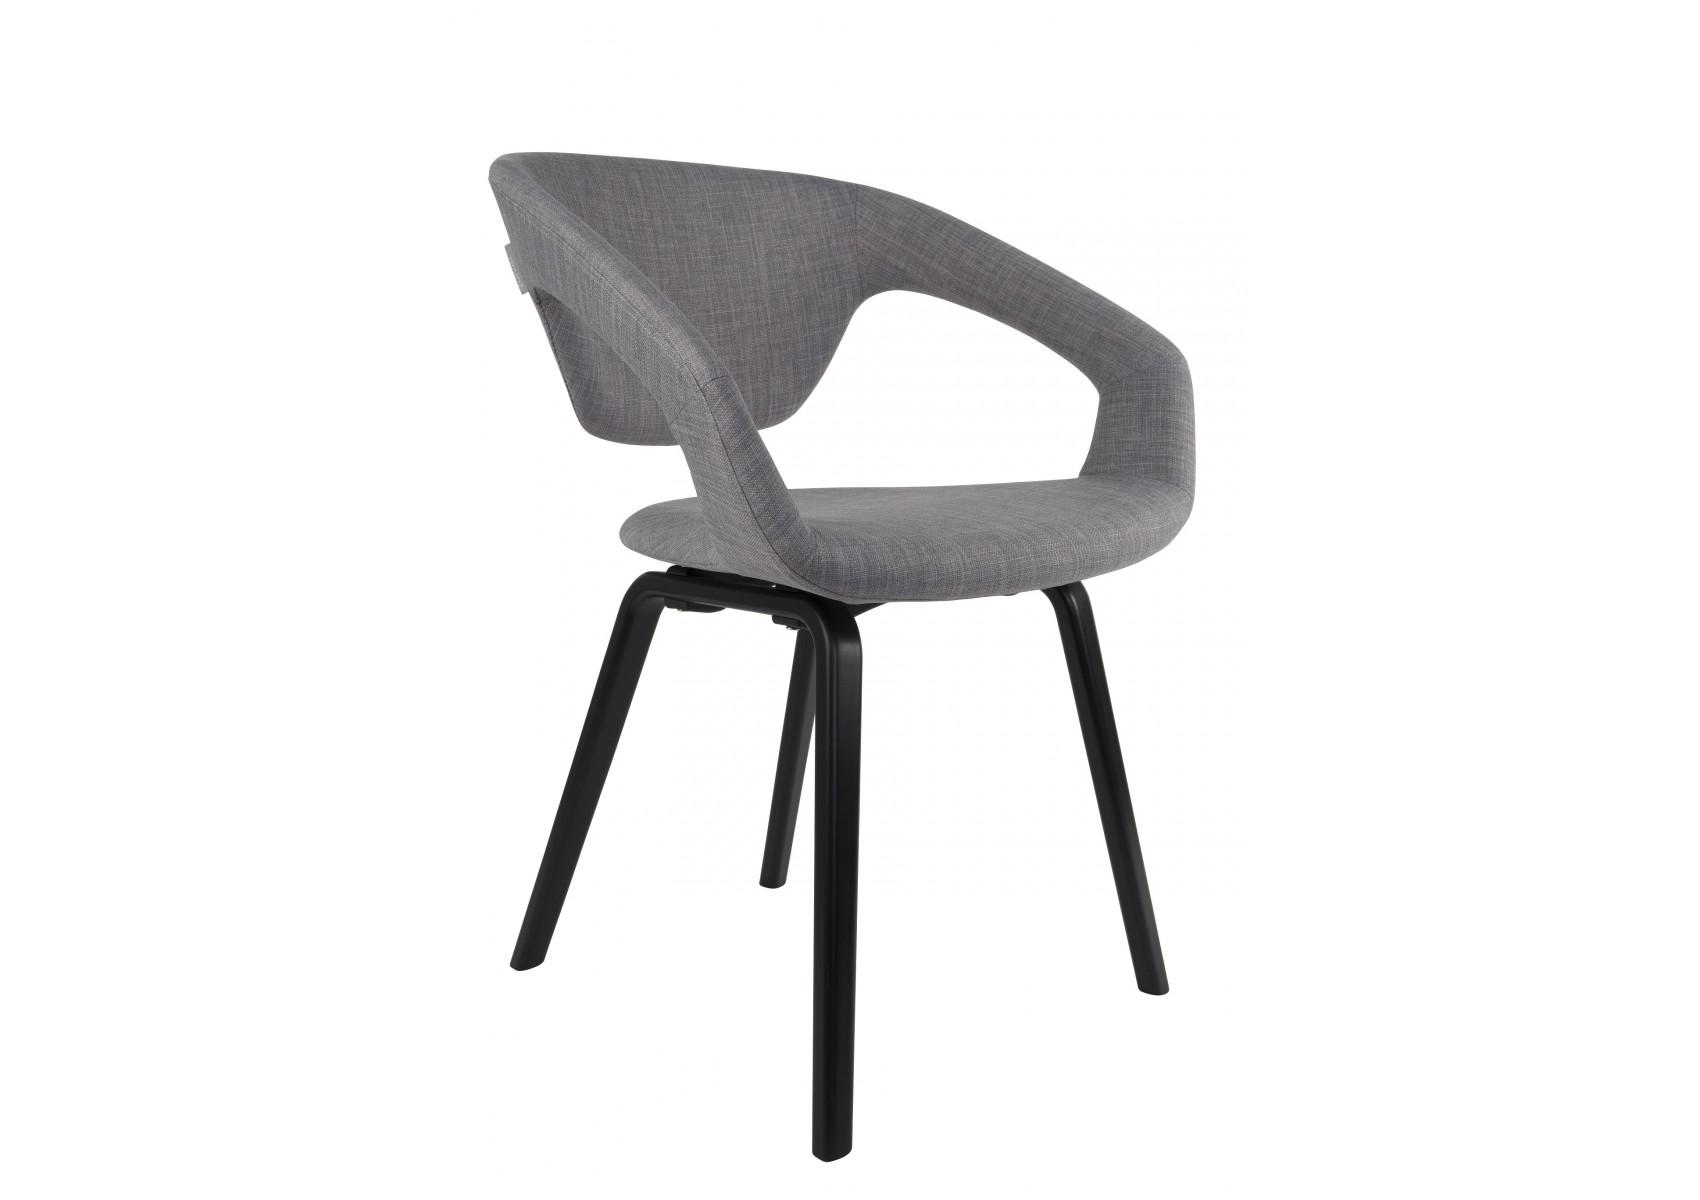 chaises tissu pieds bois scandinave flex back zuiver. Black Bedroom Furniture Sets. Home Design Ideas